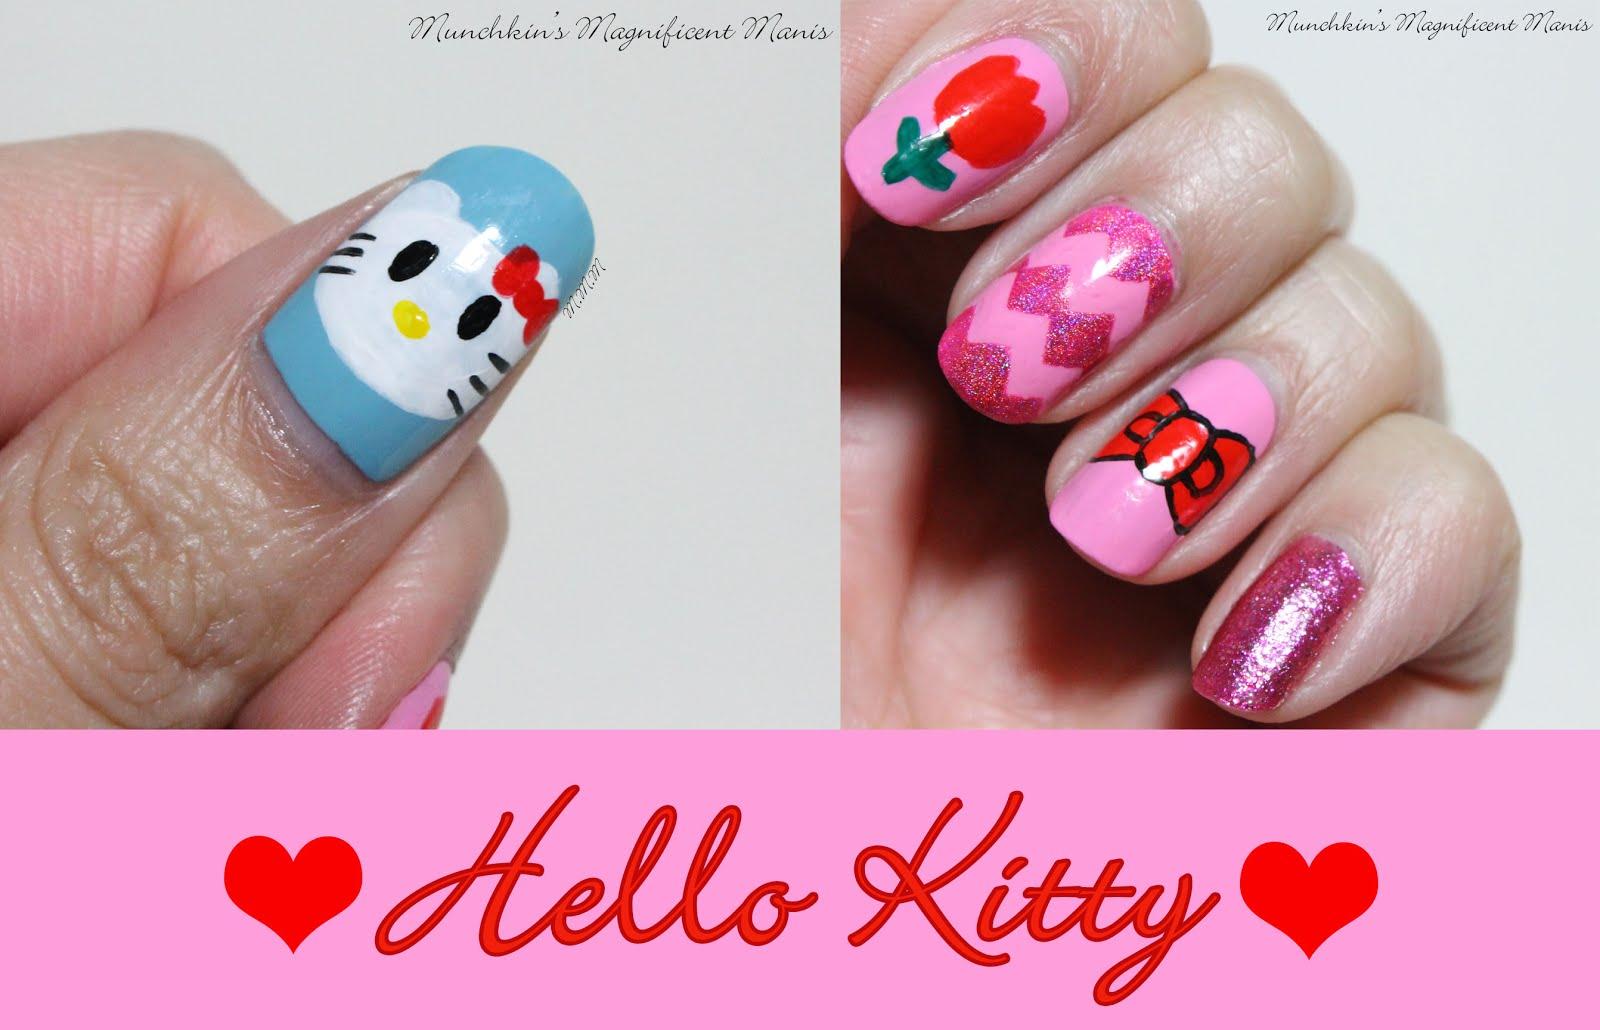 Munchkins Magnificent Manis Hello Kitty Nail Design